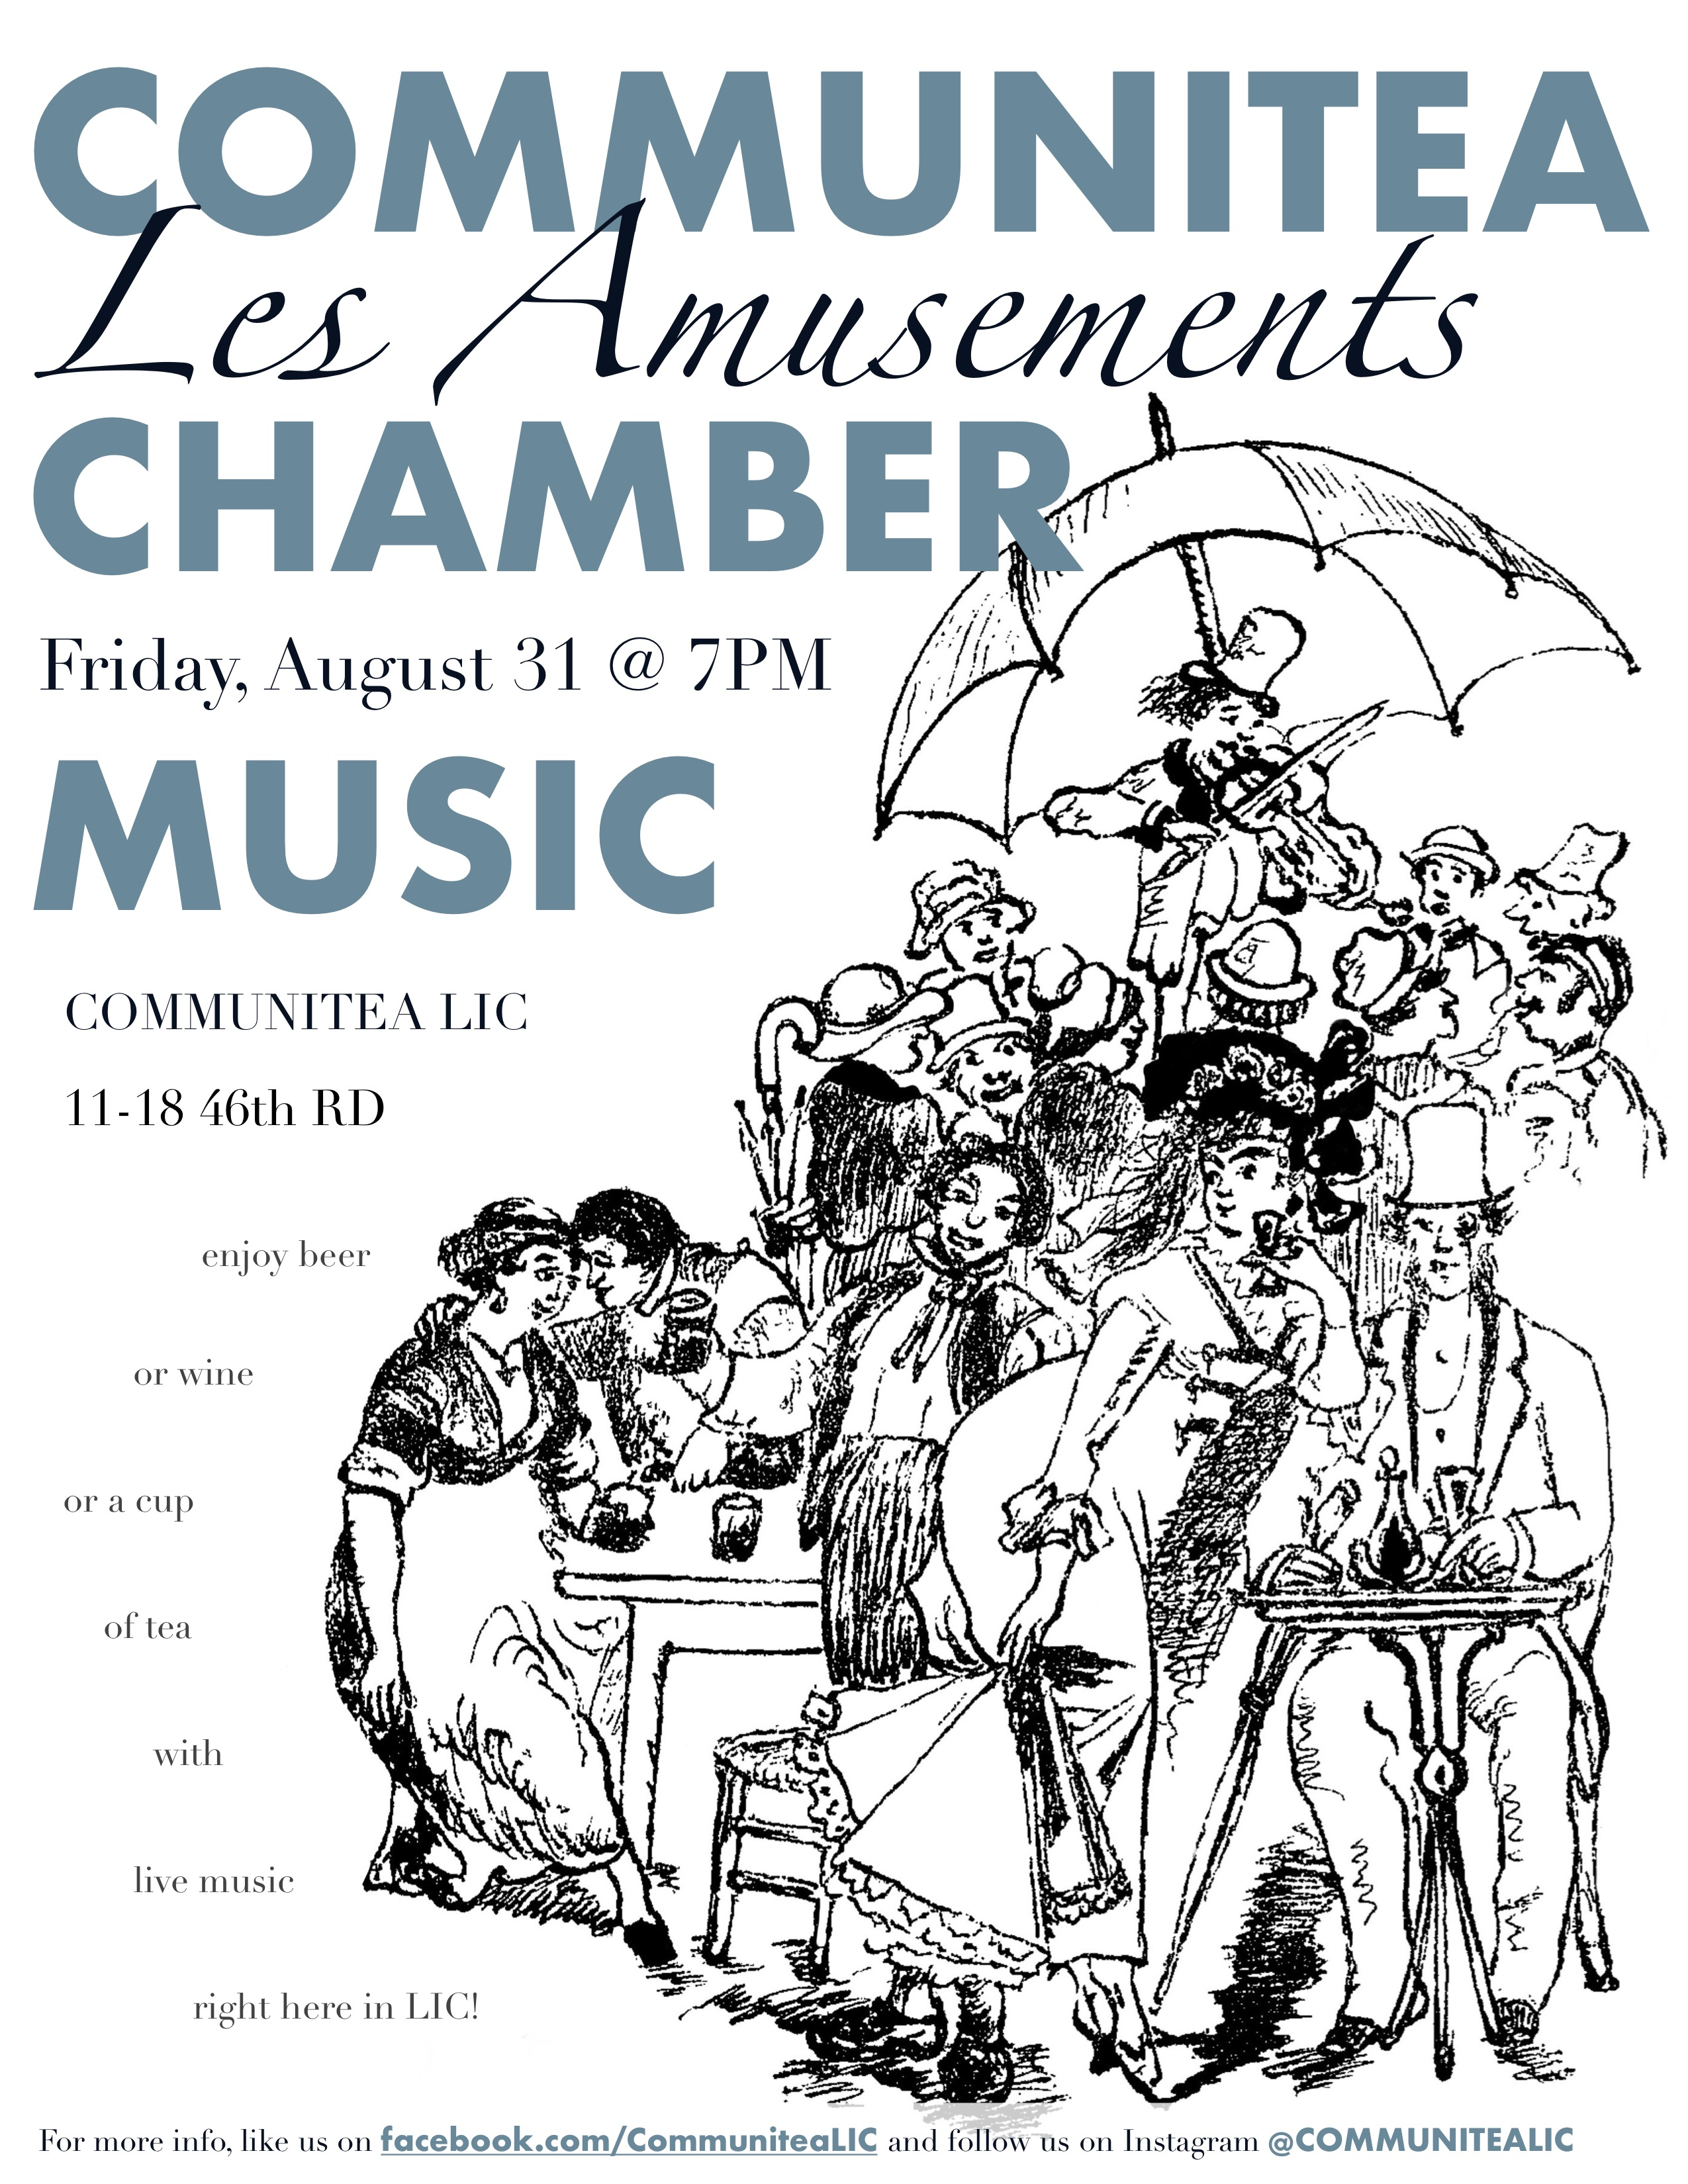 Communitea Chamber Music Poster - August